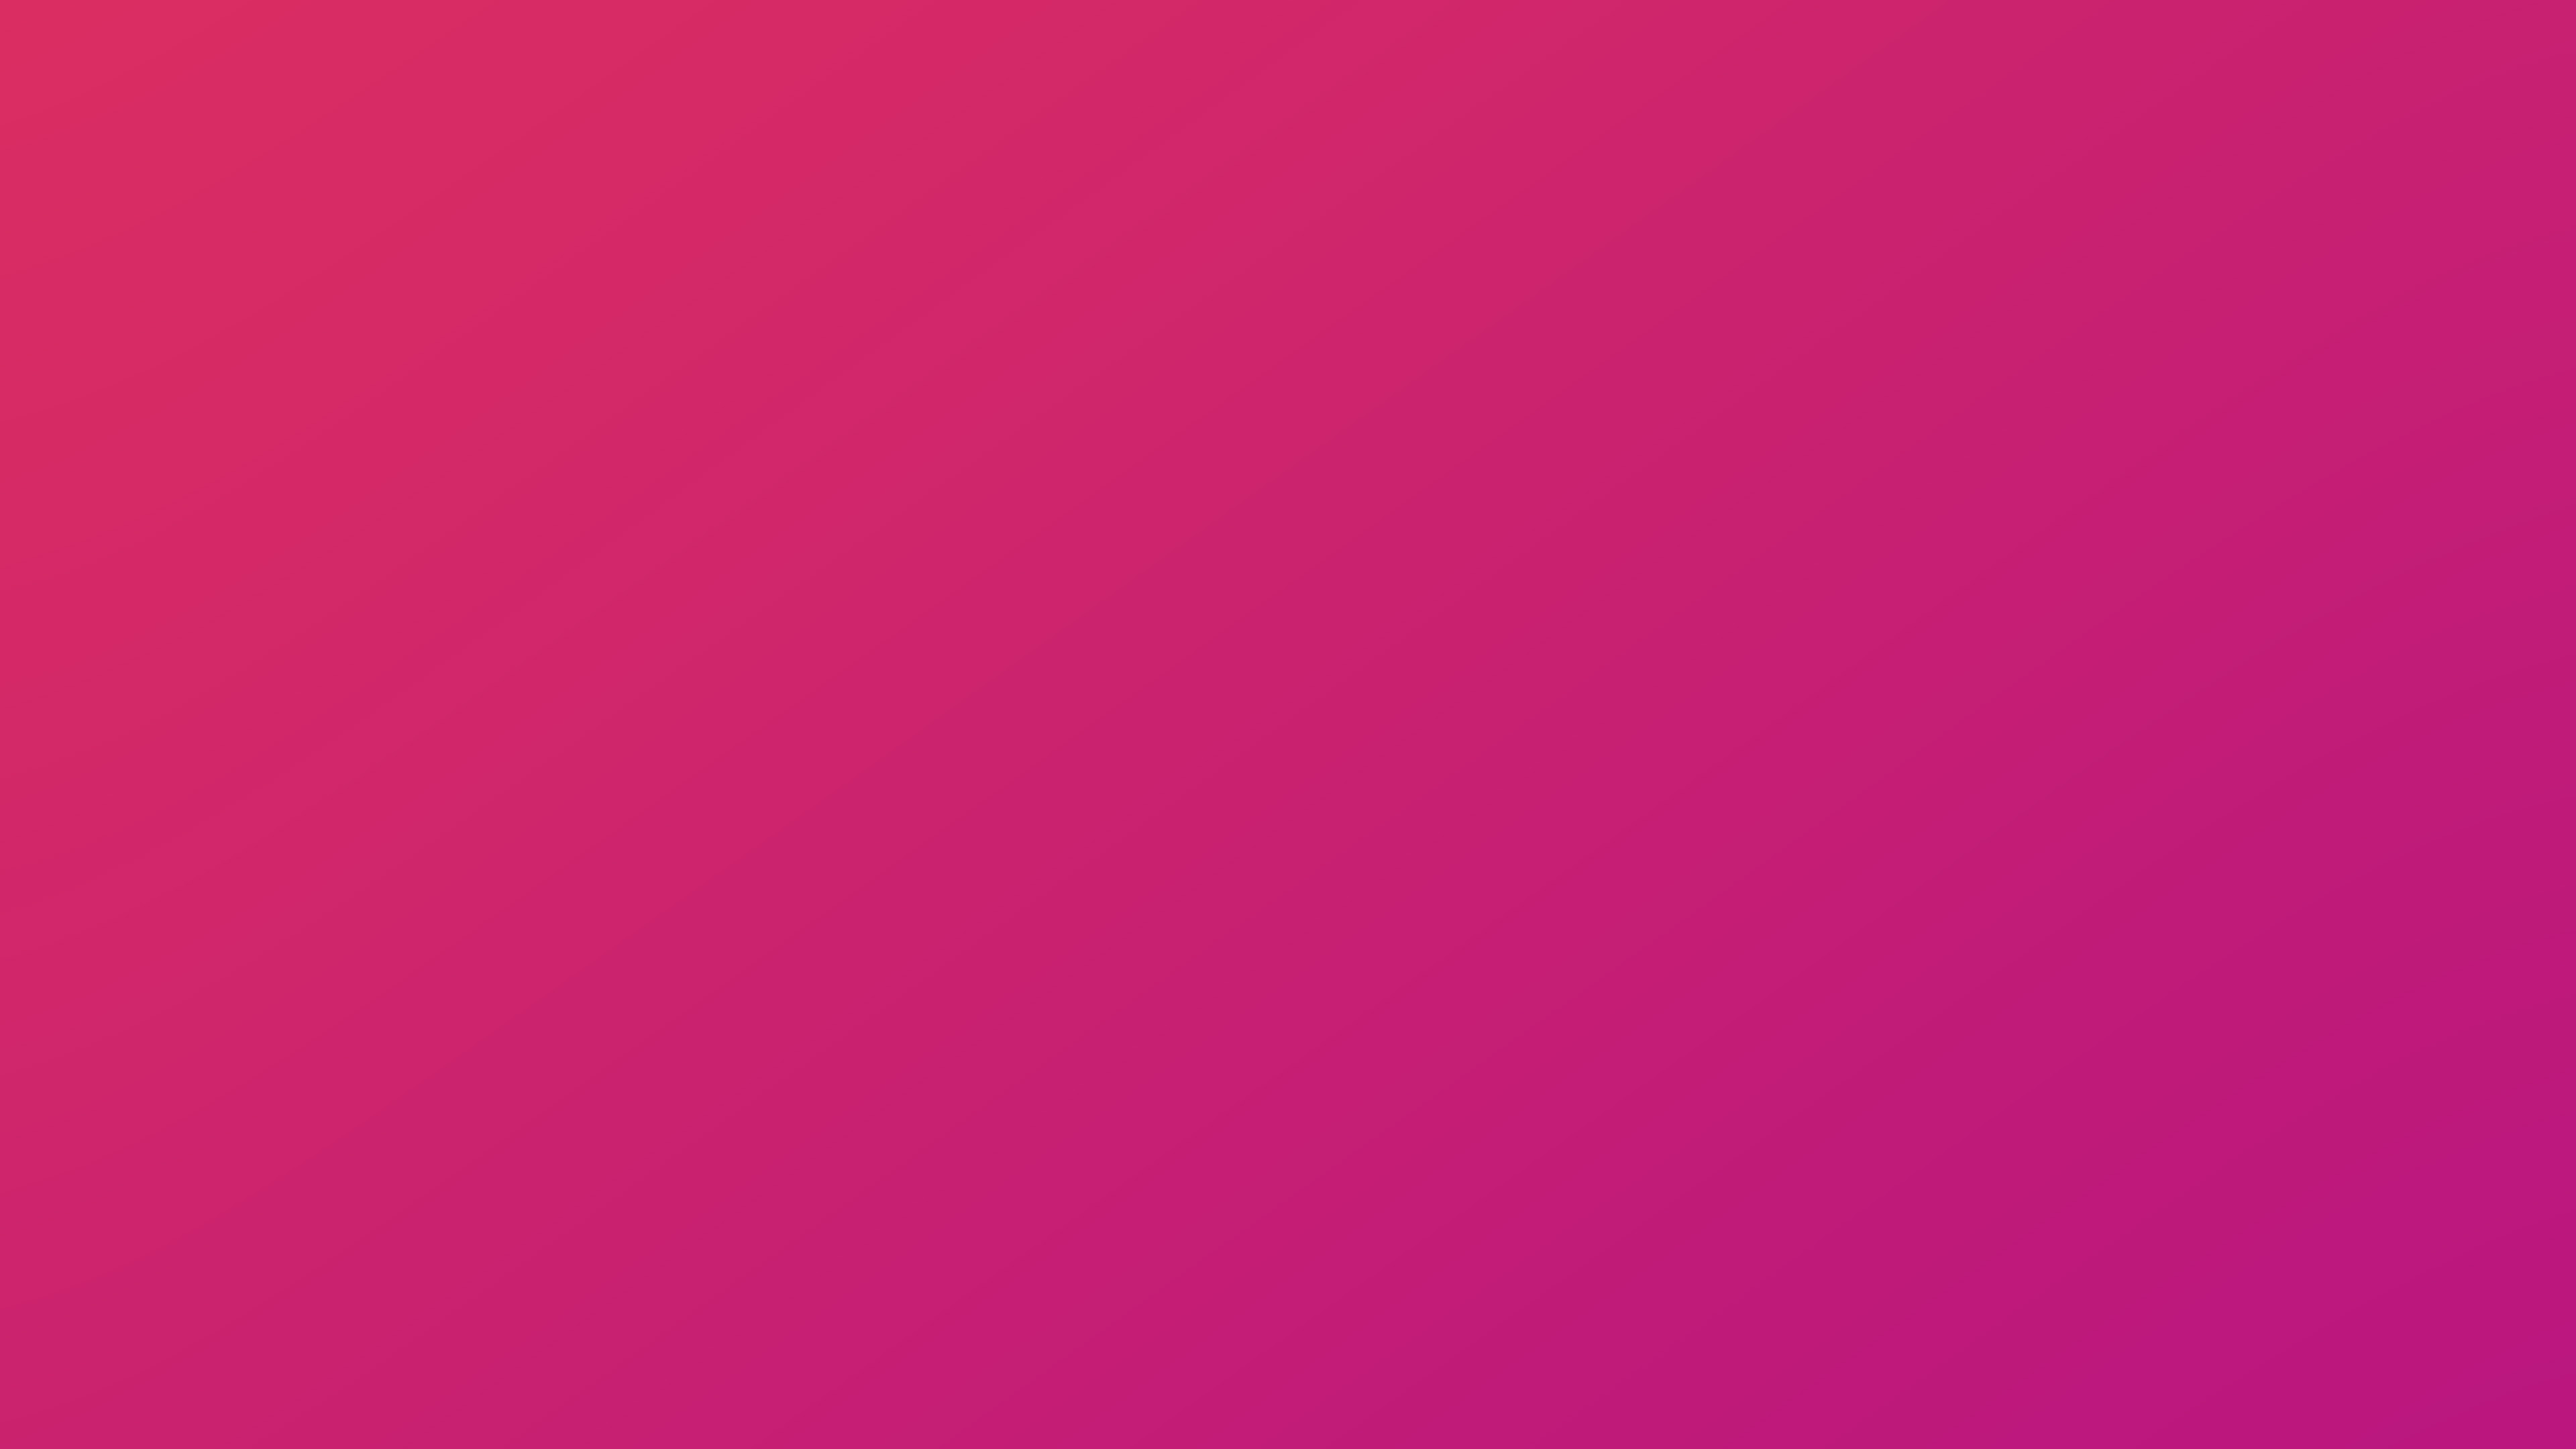 Iphone 11 Wallpaper Cute Purple